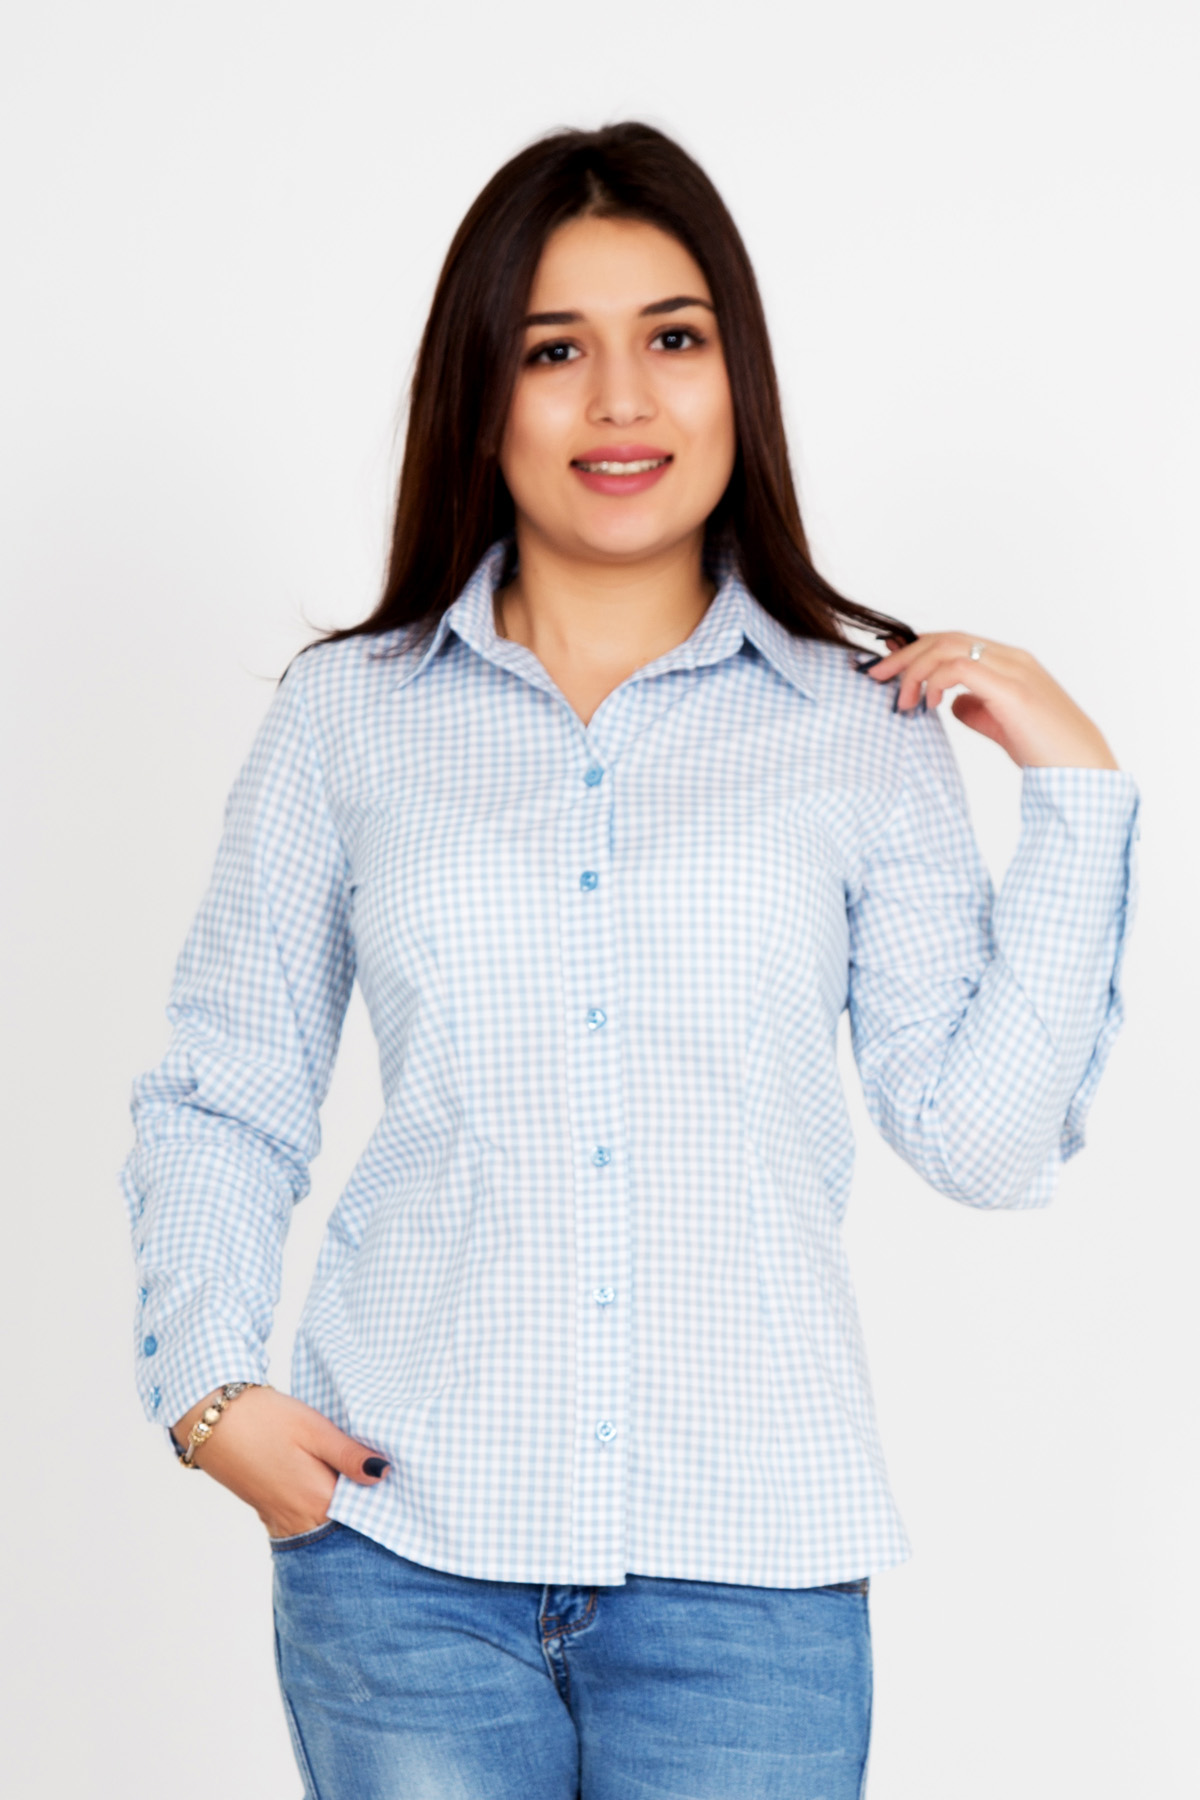 Жен. рубашка Герти р. 46Рубашки<br>Обхват груди: 92 см <br>Обхват талии: 74 см <br>Обхват бедер: 100 см <br>Длина по спинке: 67 см <br>Рост: 167 см<br><br>Тип: Жен. рубашка<br>Размер: 46<br>Материал: Шотландка